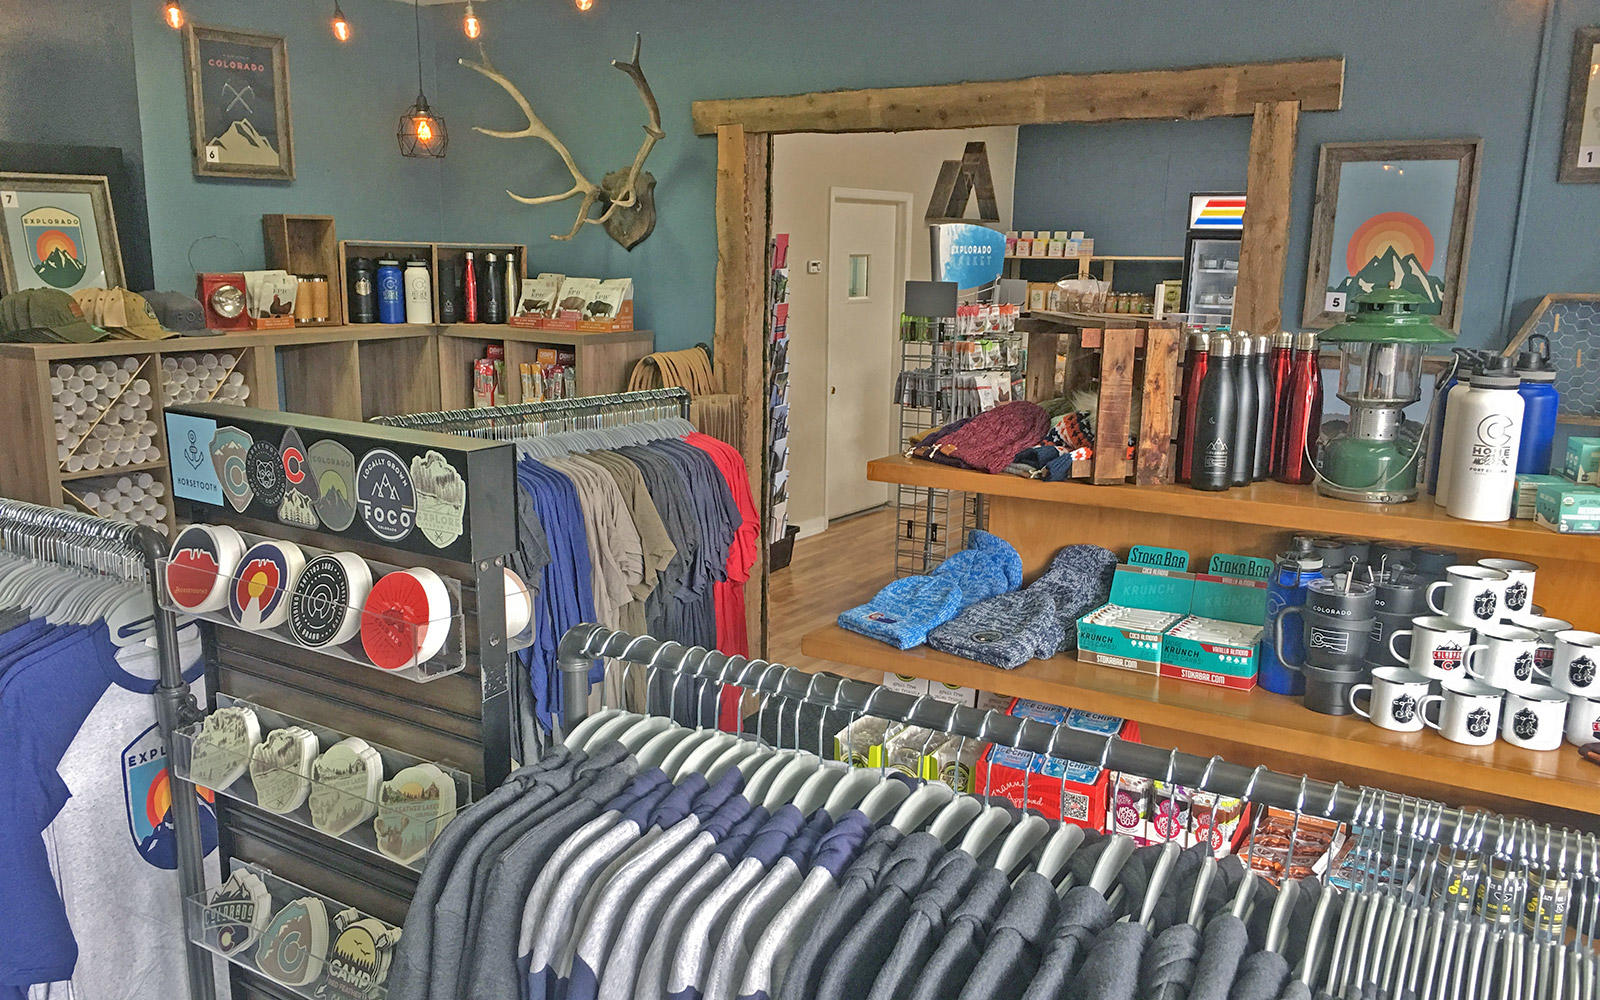 Explorado Market (Keto & Paleo Grocery) image 1